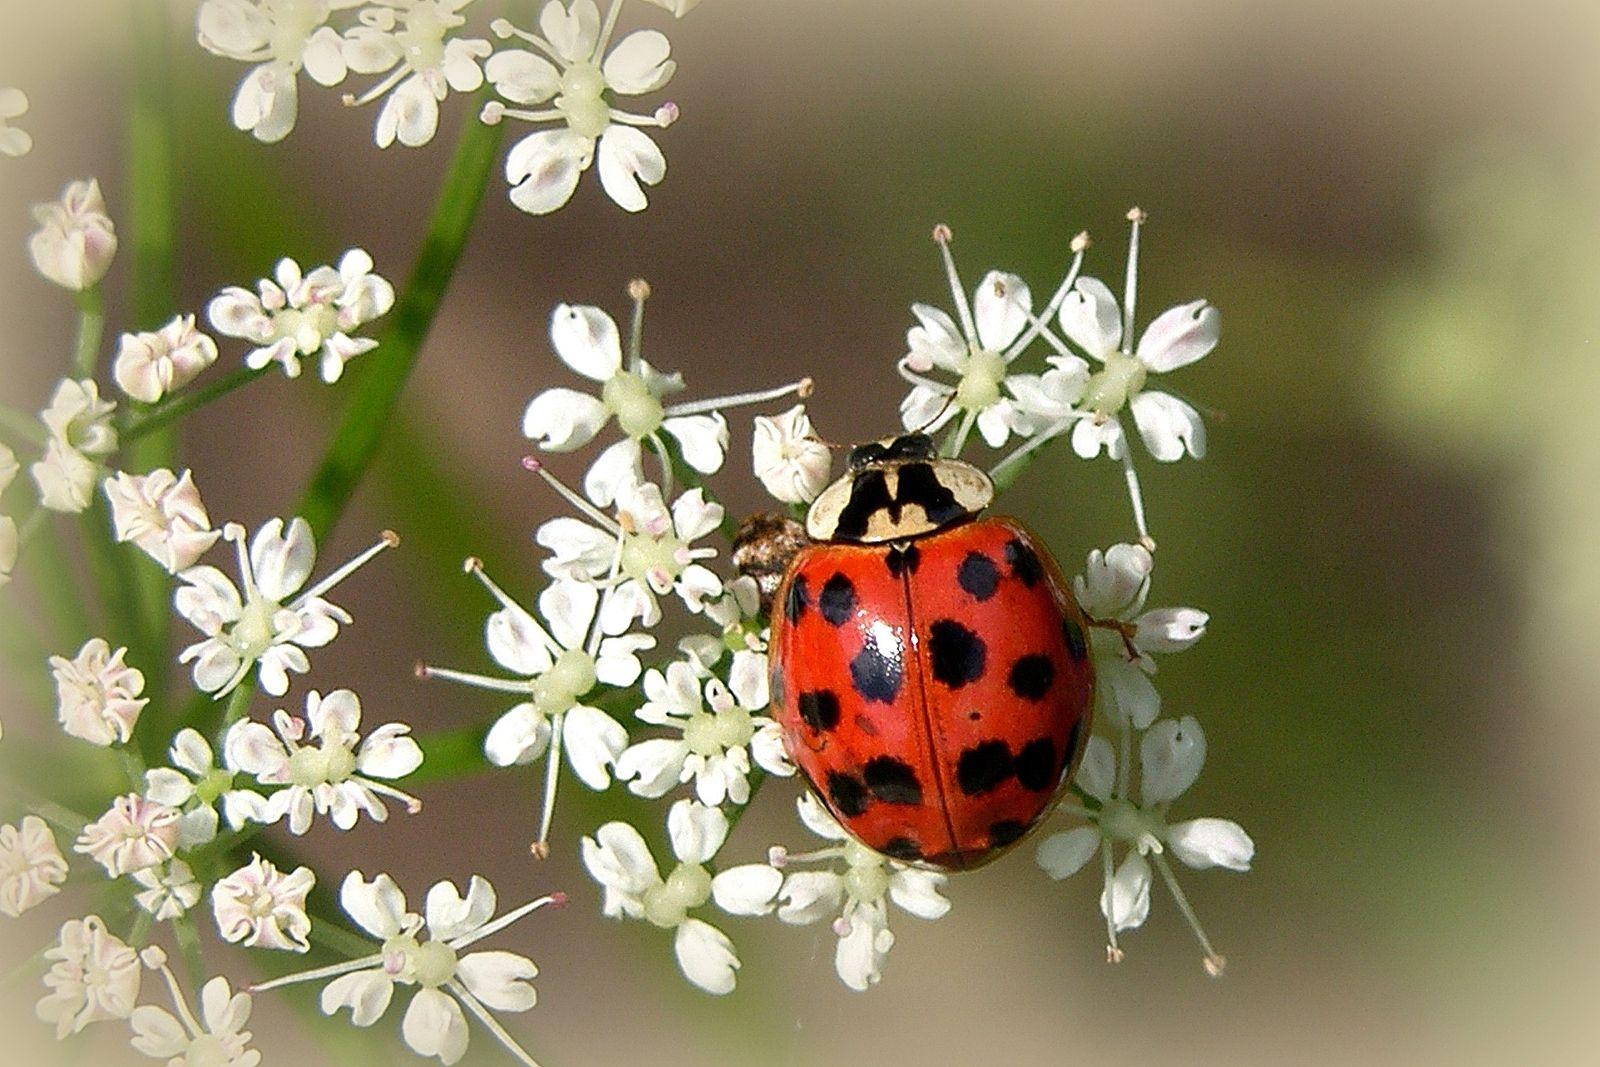 EINMALIGE VERWENDUNG Klimawandel/ Harlequin Ladybird/ Harmonia axyridis